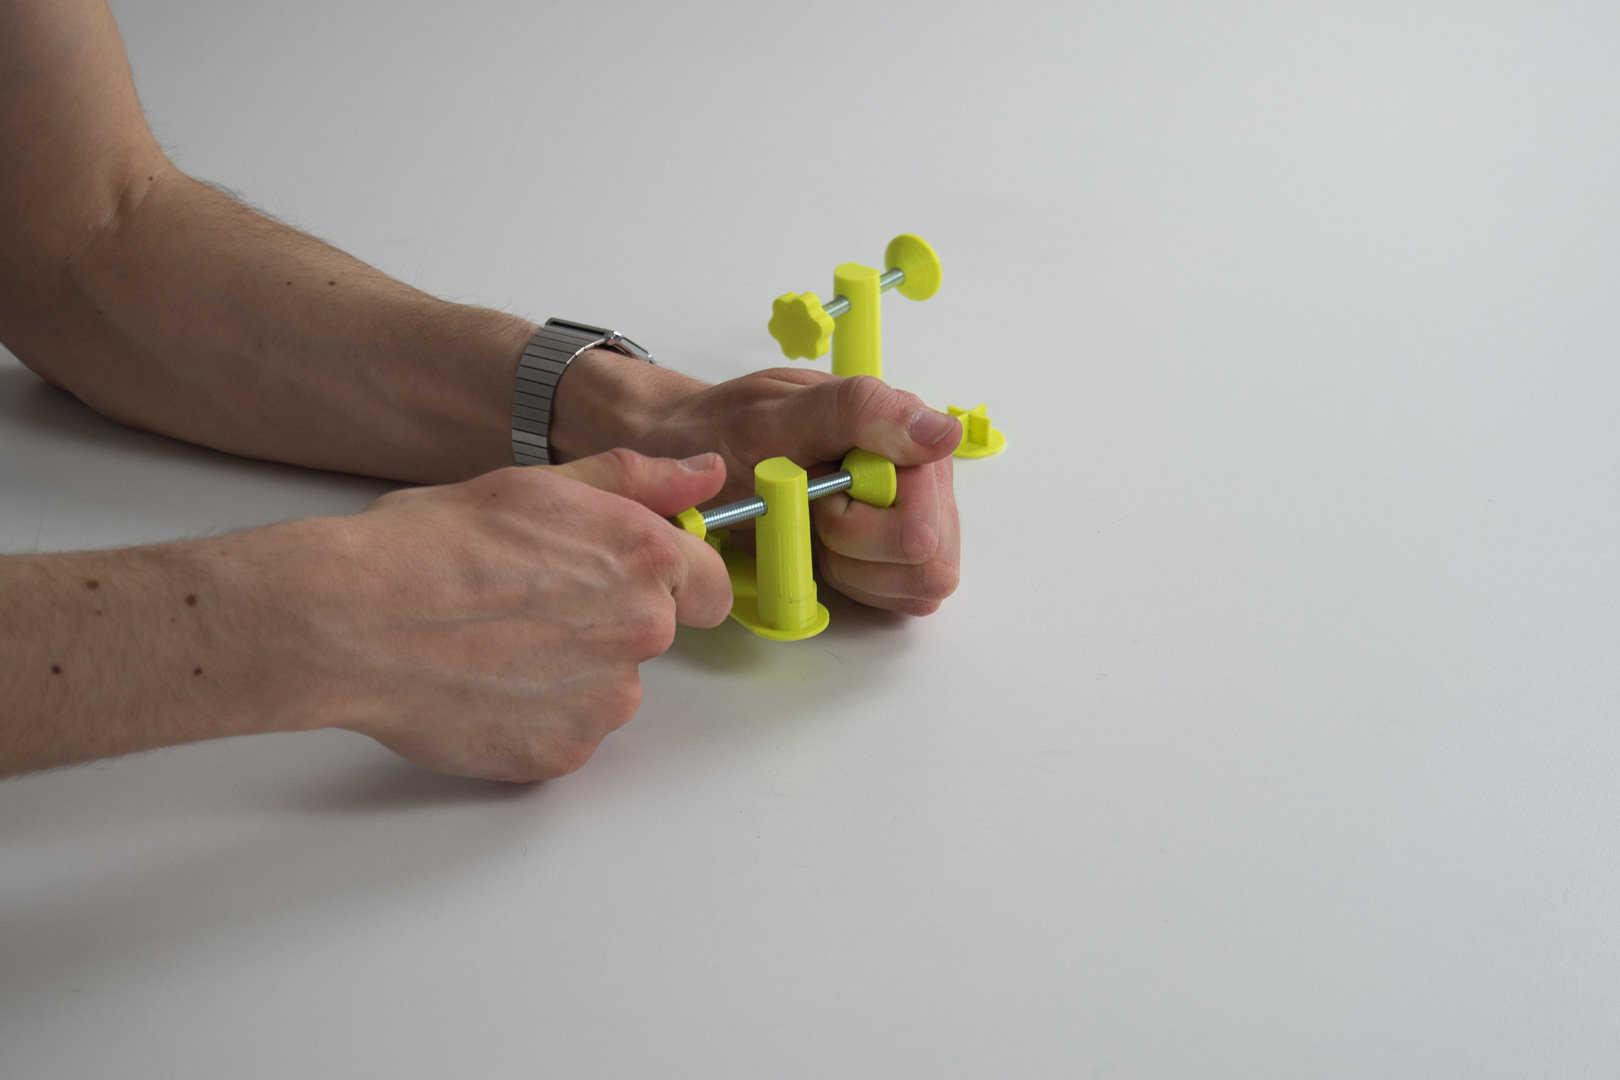 Medium 05 assemblage des plugs serre joint